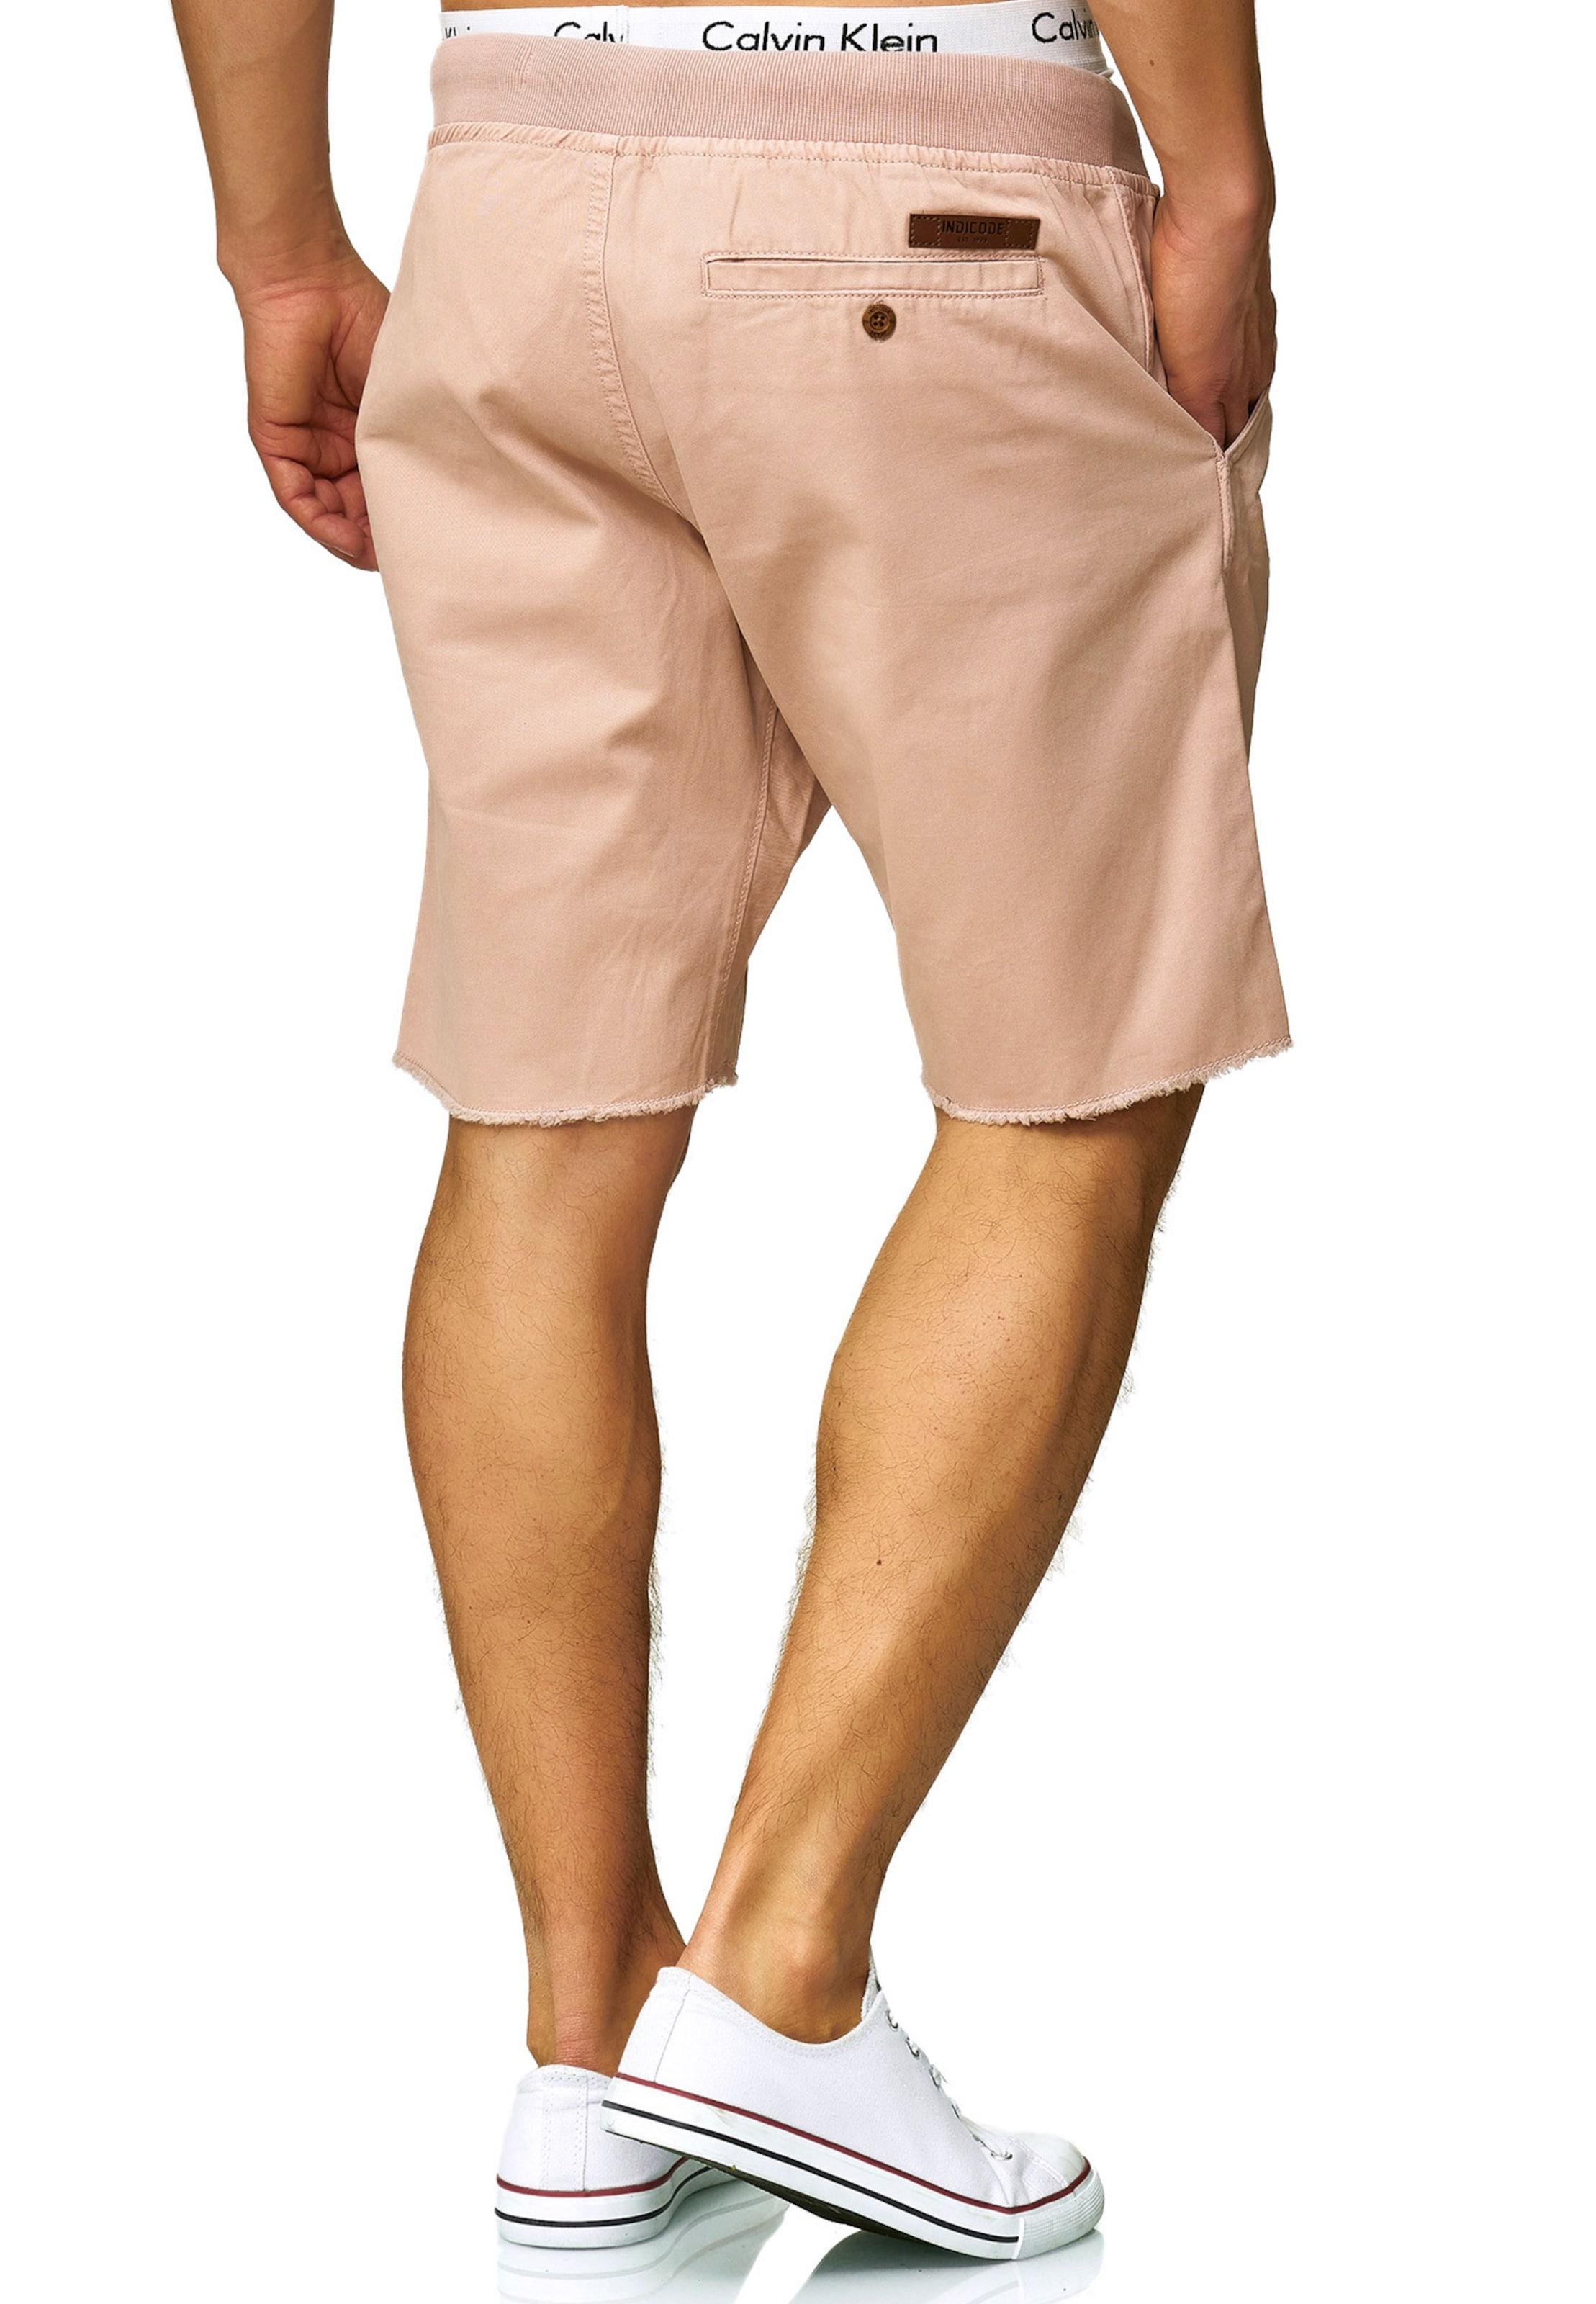 Rose En Ancienne Indicode Pantalon 'carver' Chino Jeans uPkiZX